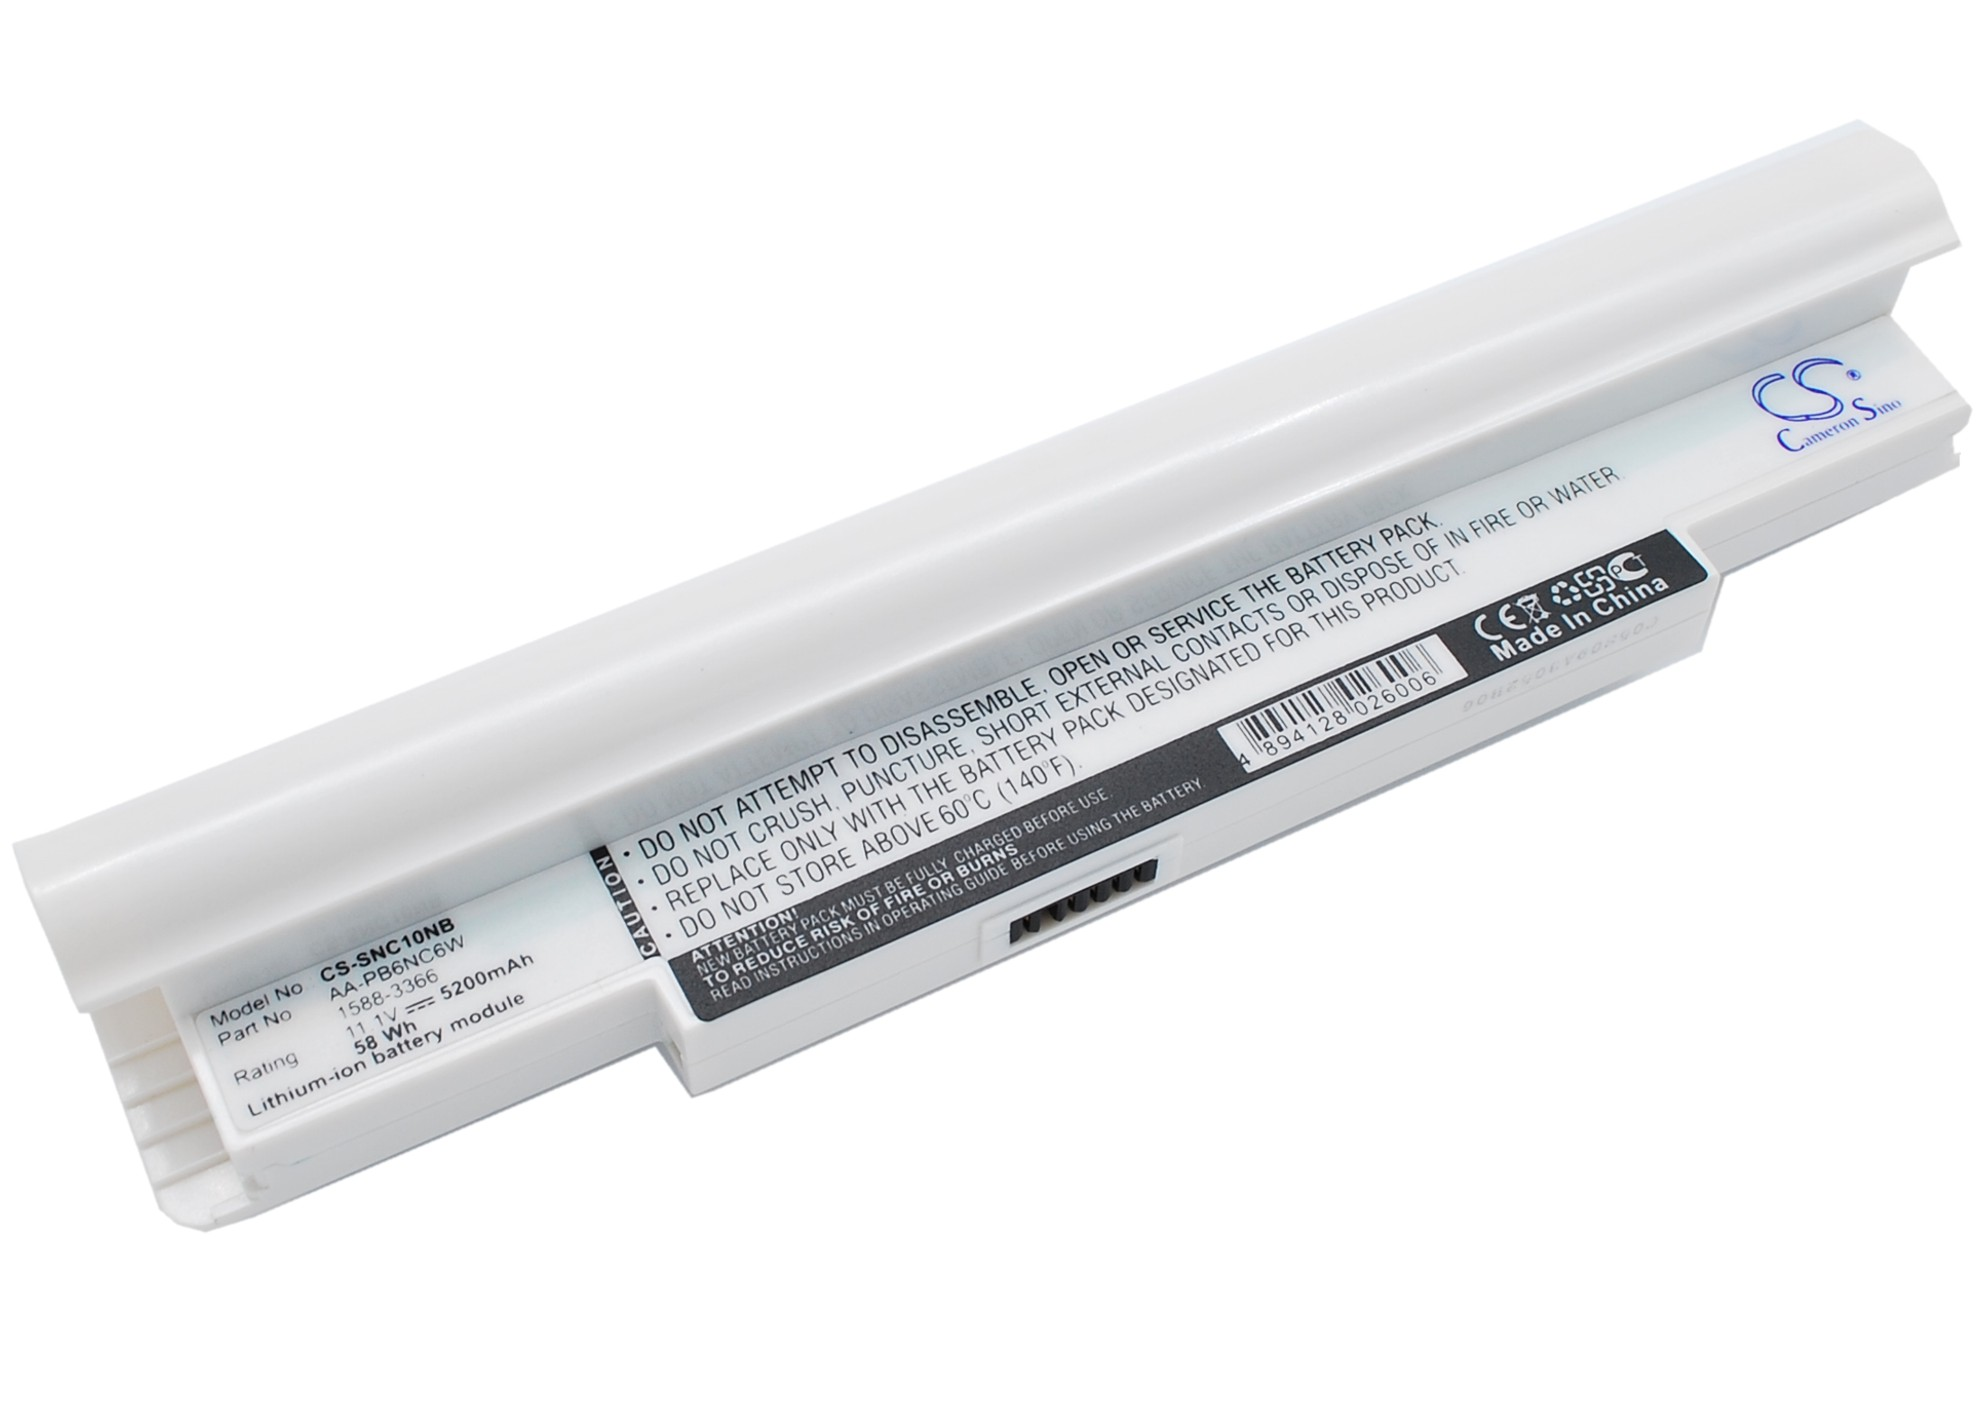 Cameron Sino baterie do notebooků pro SAMSUNG NP-NC20 11.1V Li-ion 5200mAh bílá - neoriginální